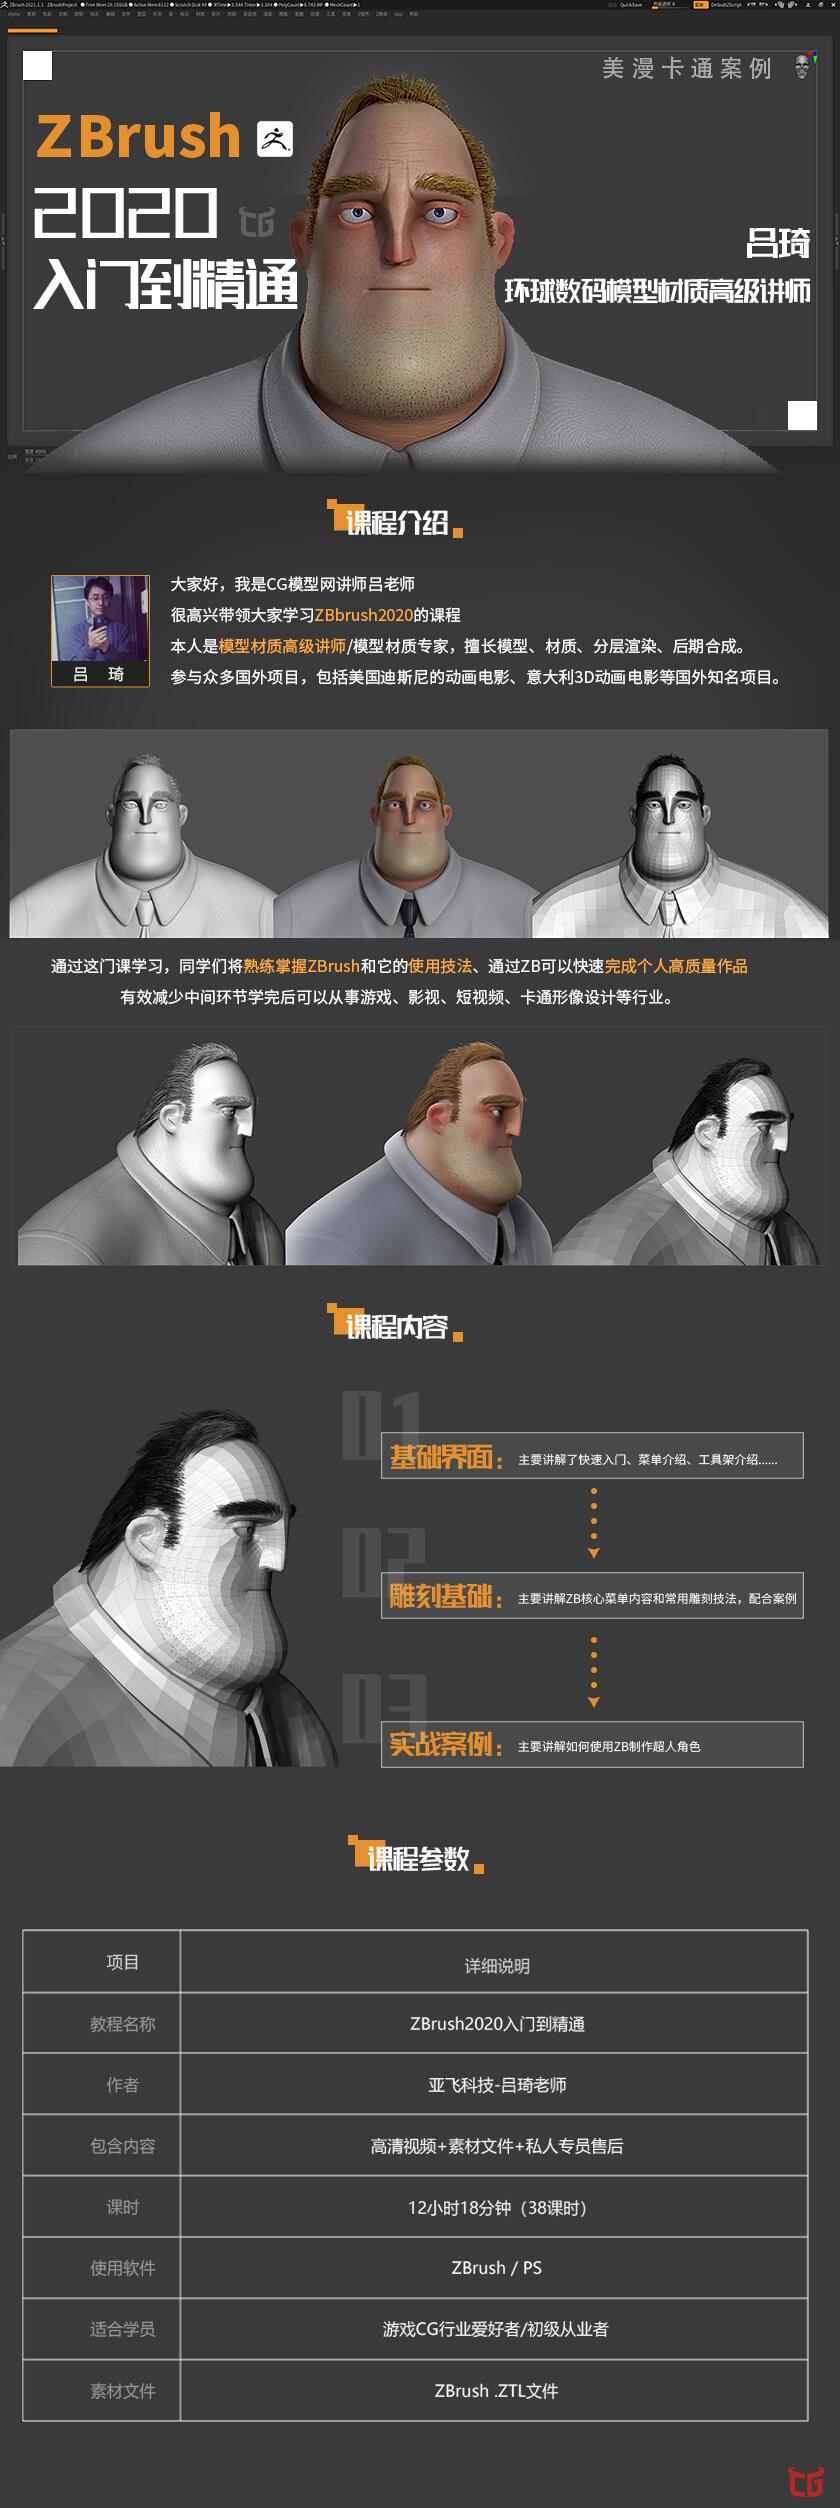 zb人物详情页.jpg